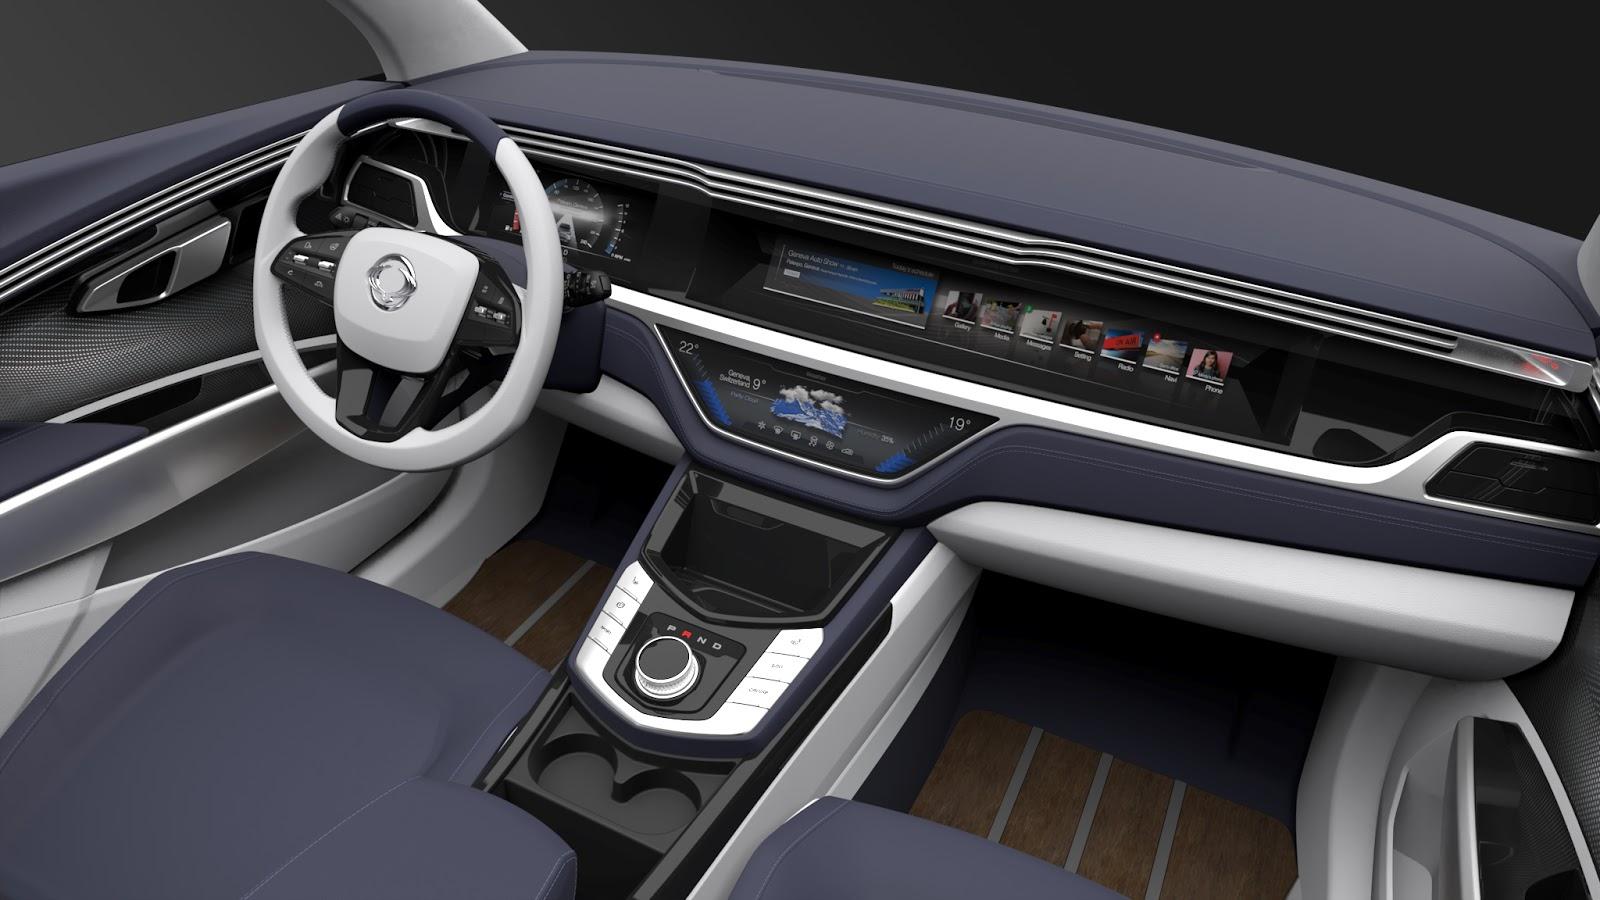 Interior%2B1 Η SSANGYONG παρουσιάζει ένα μεσαίο πολυχρηστικό SUV